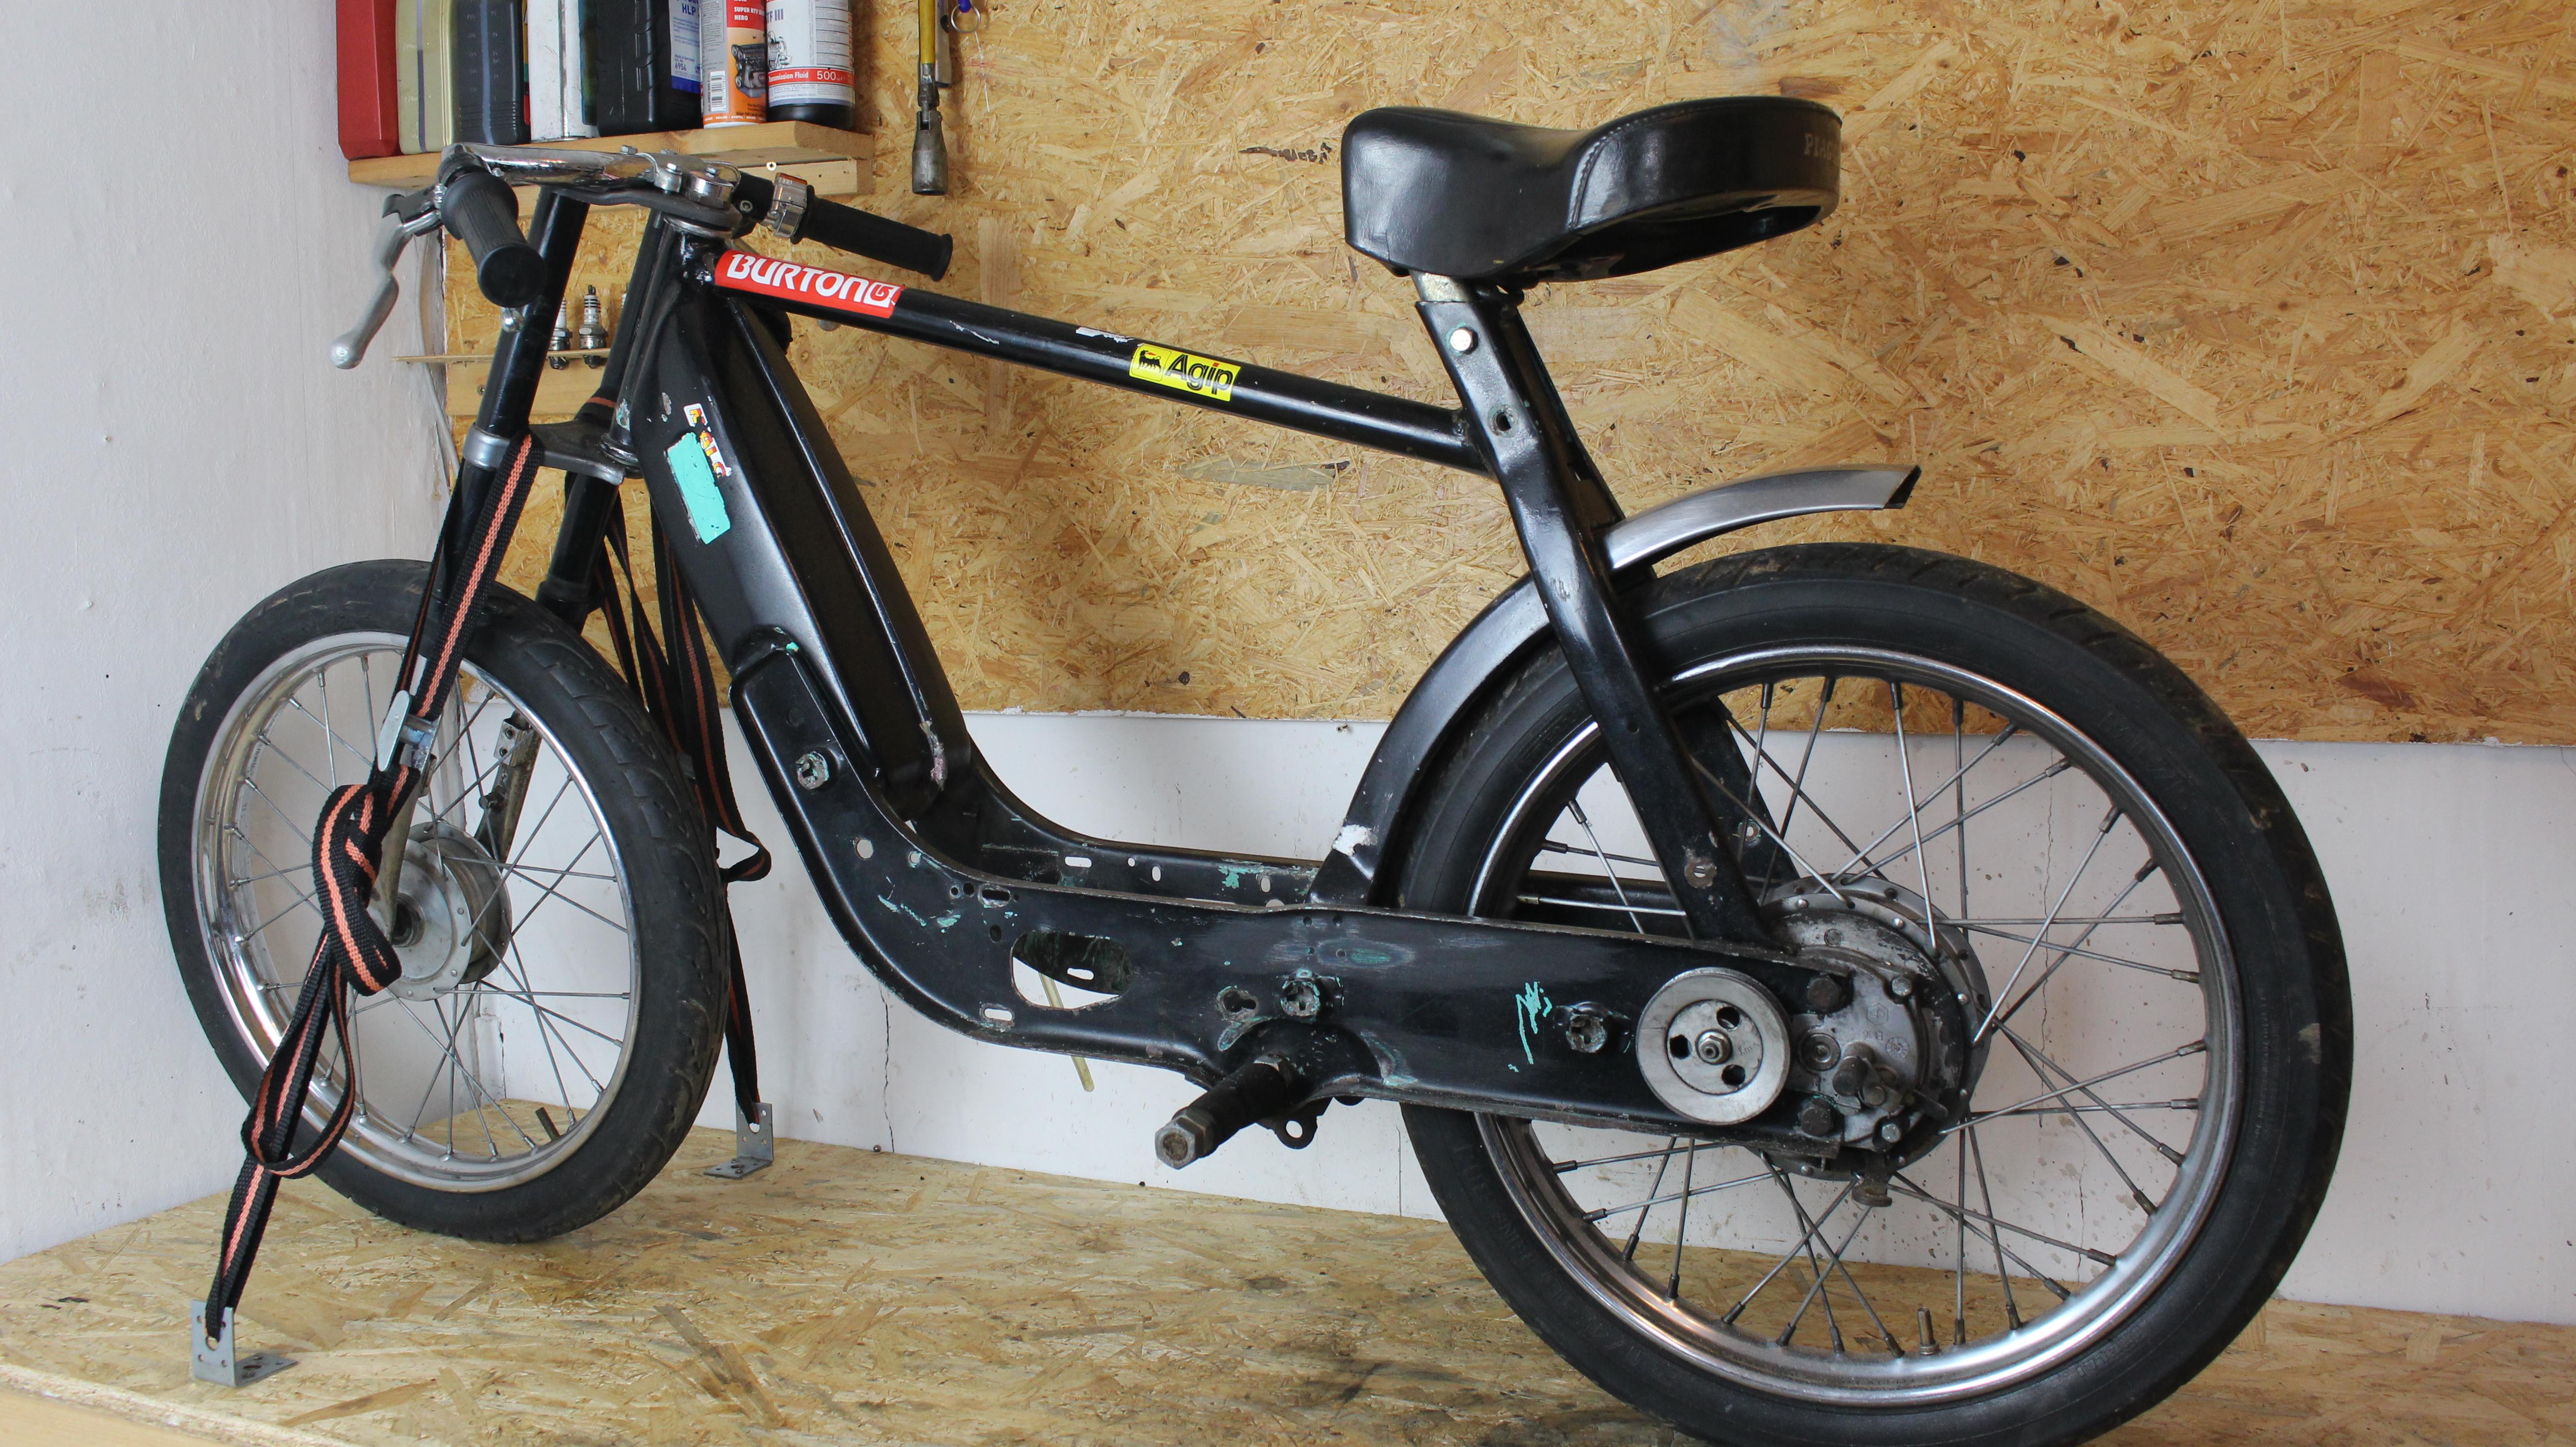 moped factory der mofa und moped blog. Black Bedroom Furniture Sets. Home Design Ideas